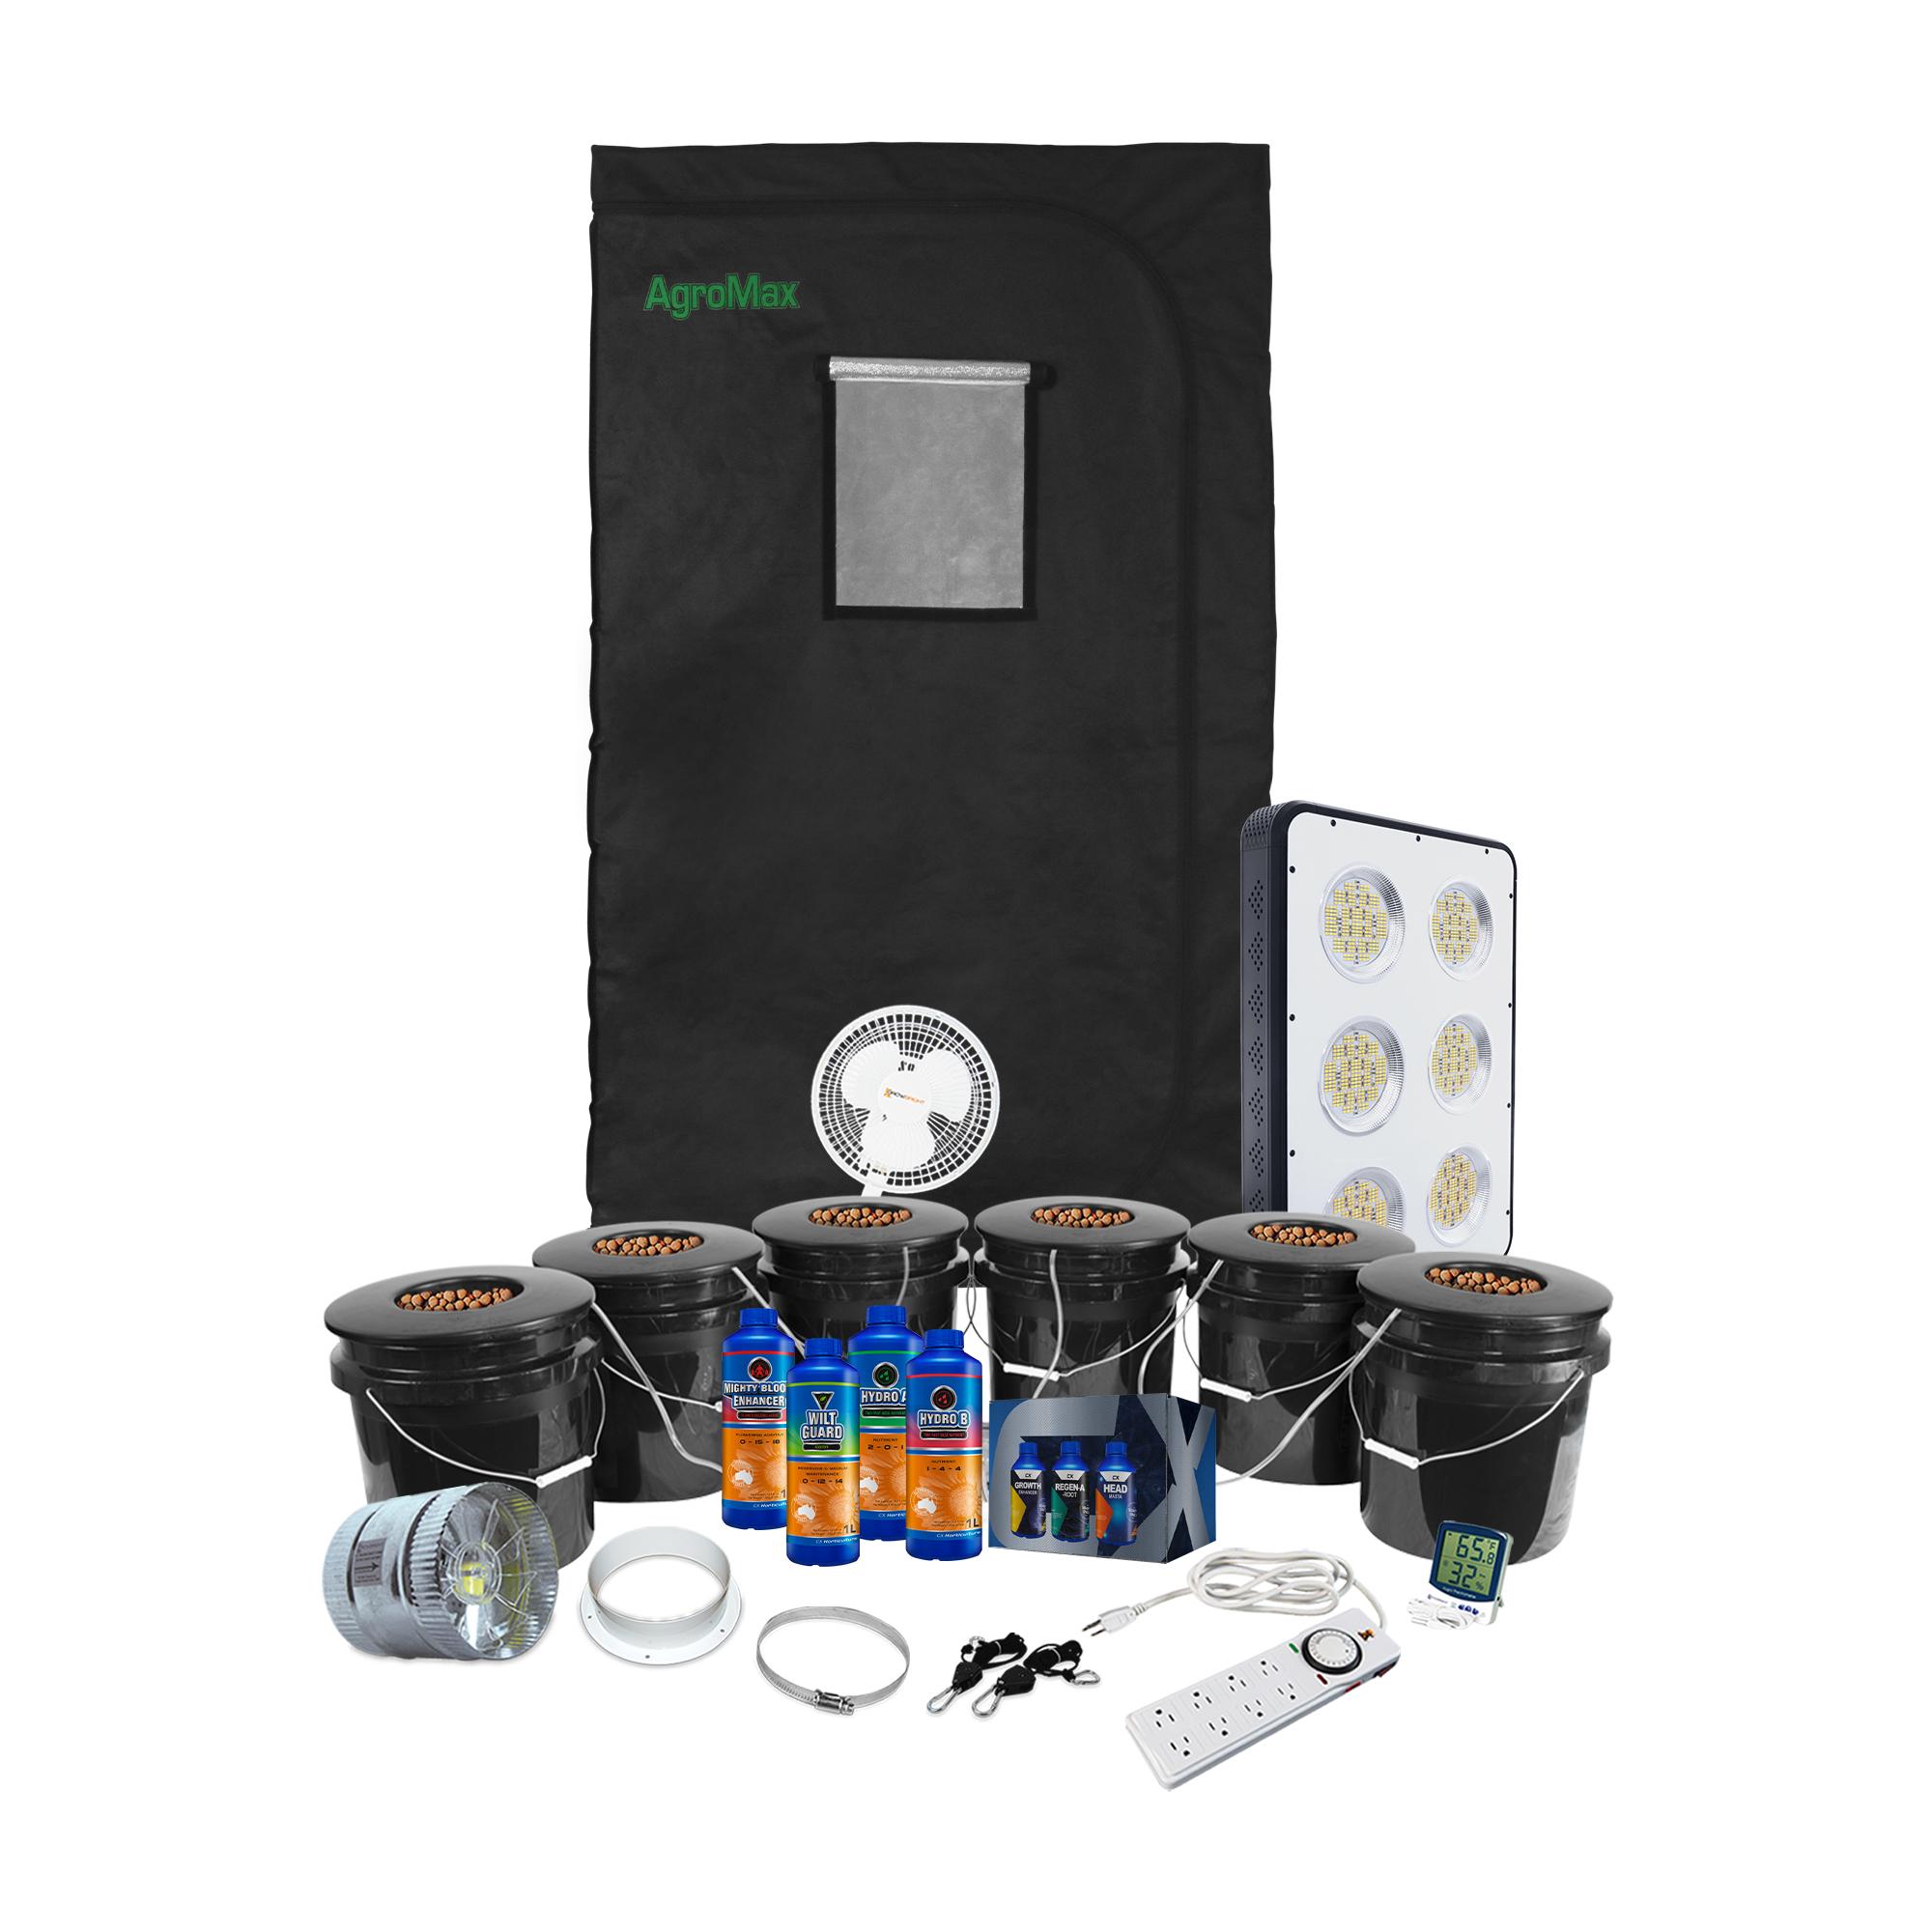 HTG 4x4 Hydroponic LED Grow Tent Kit